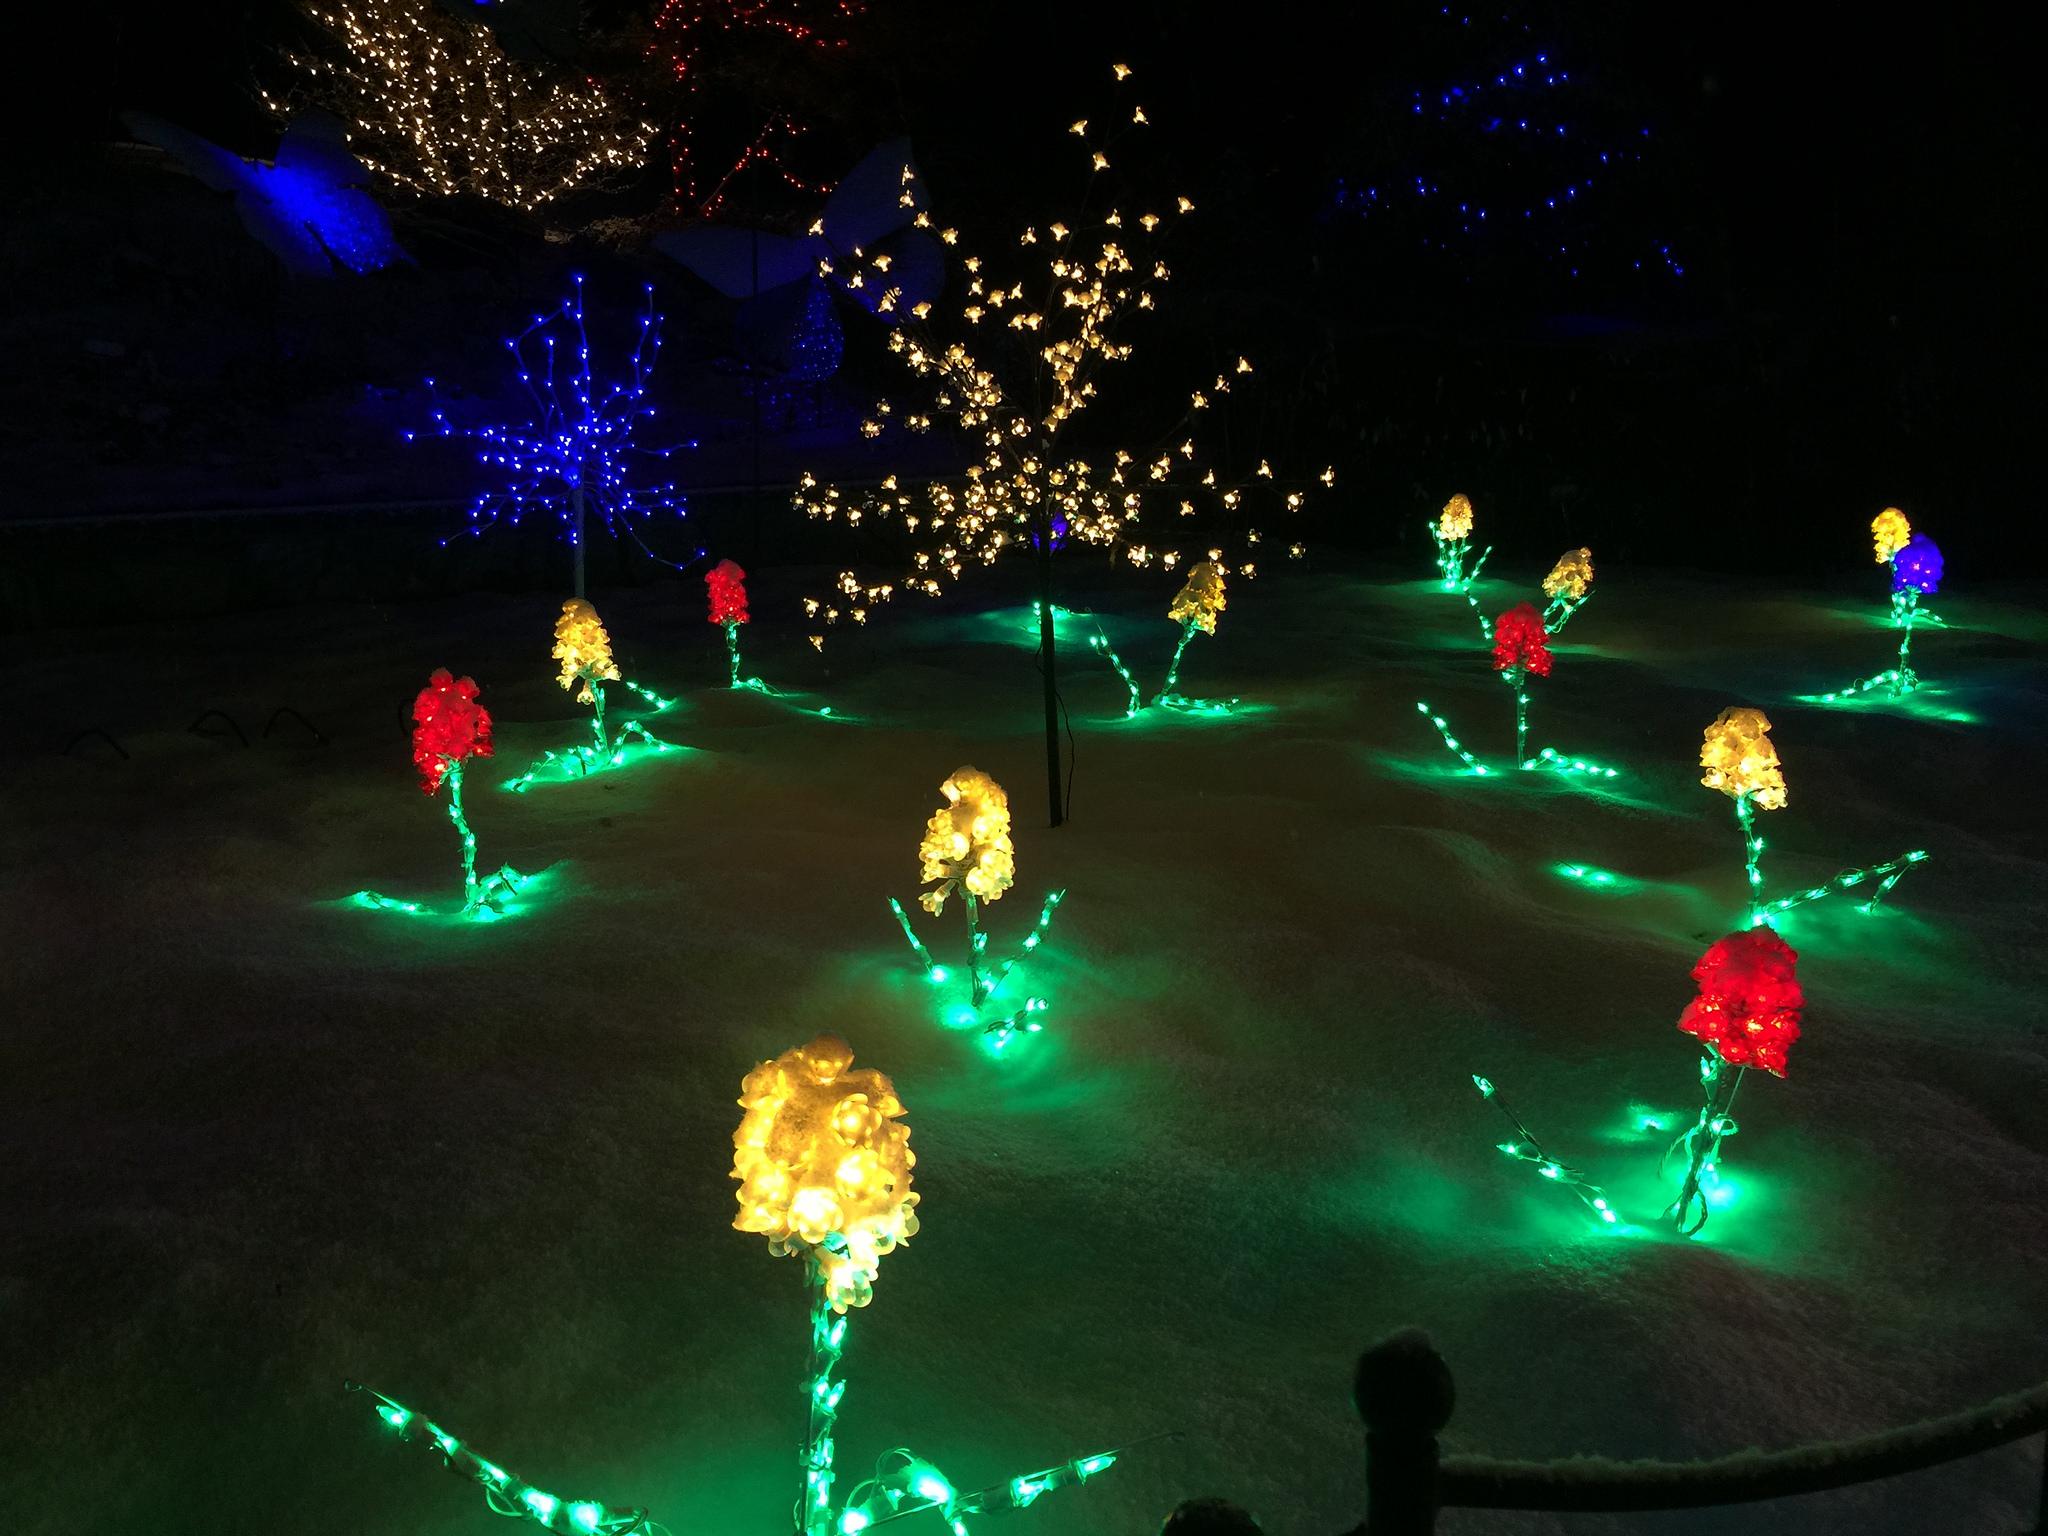 brookside gardens light display